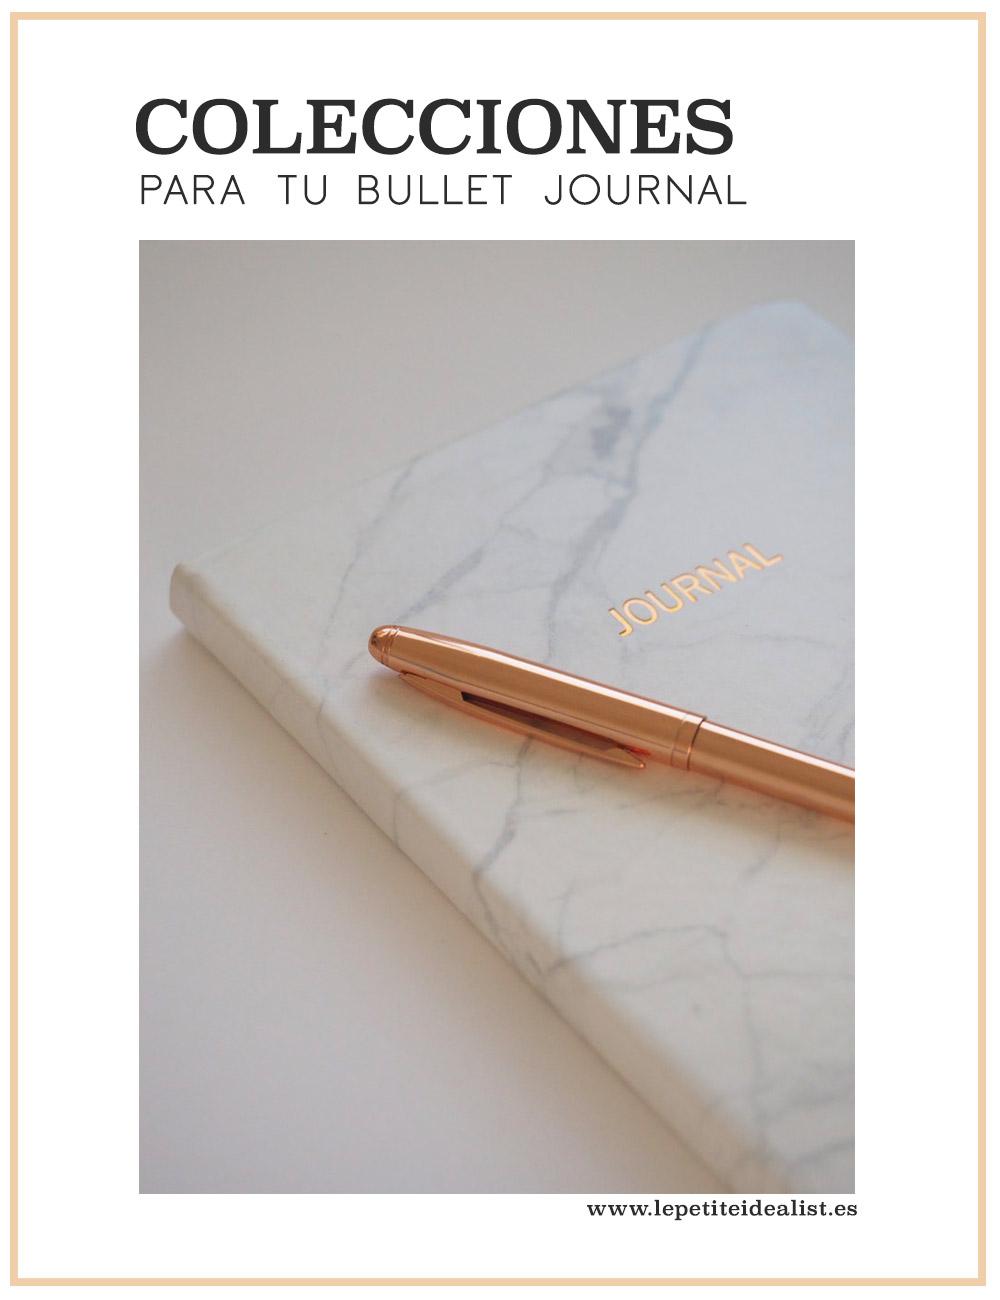 colecciones para tu bullet journal